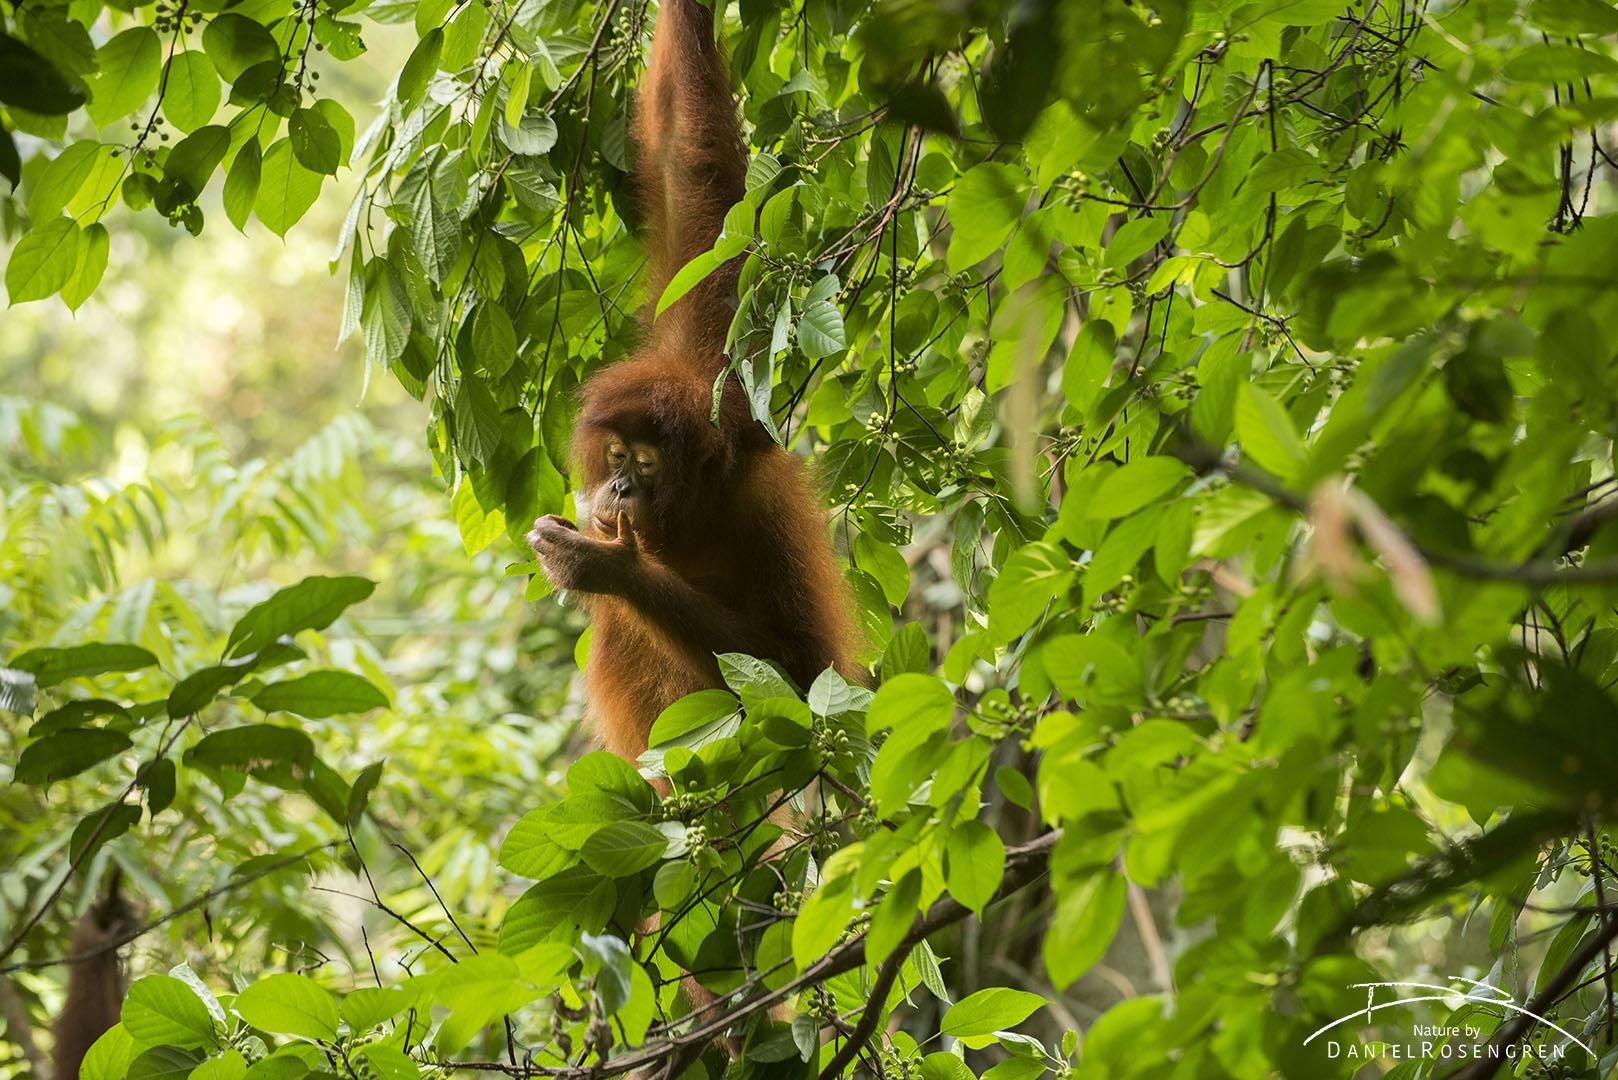 An Orang-utan in Bukit Tigapuluh, Sumatra. © Daniel Rosengren